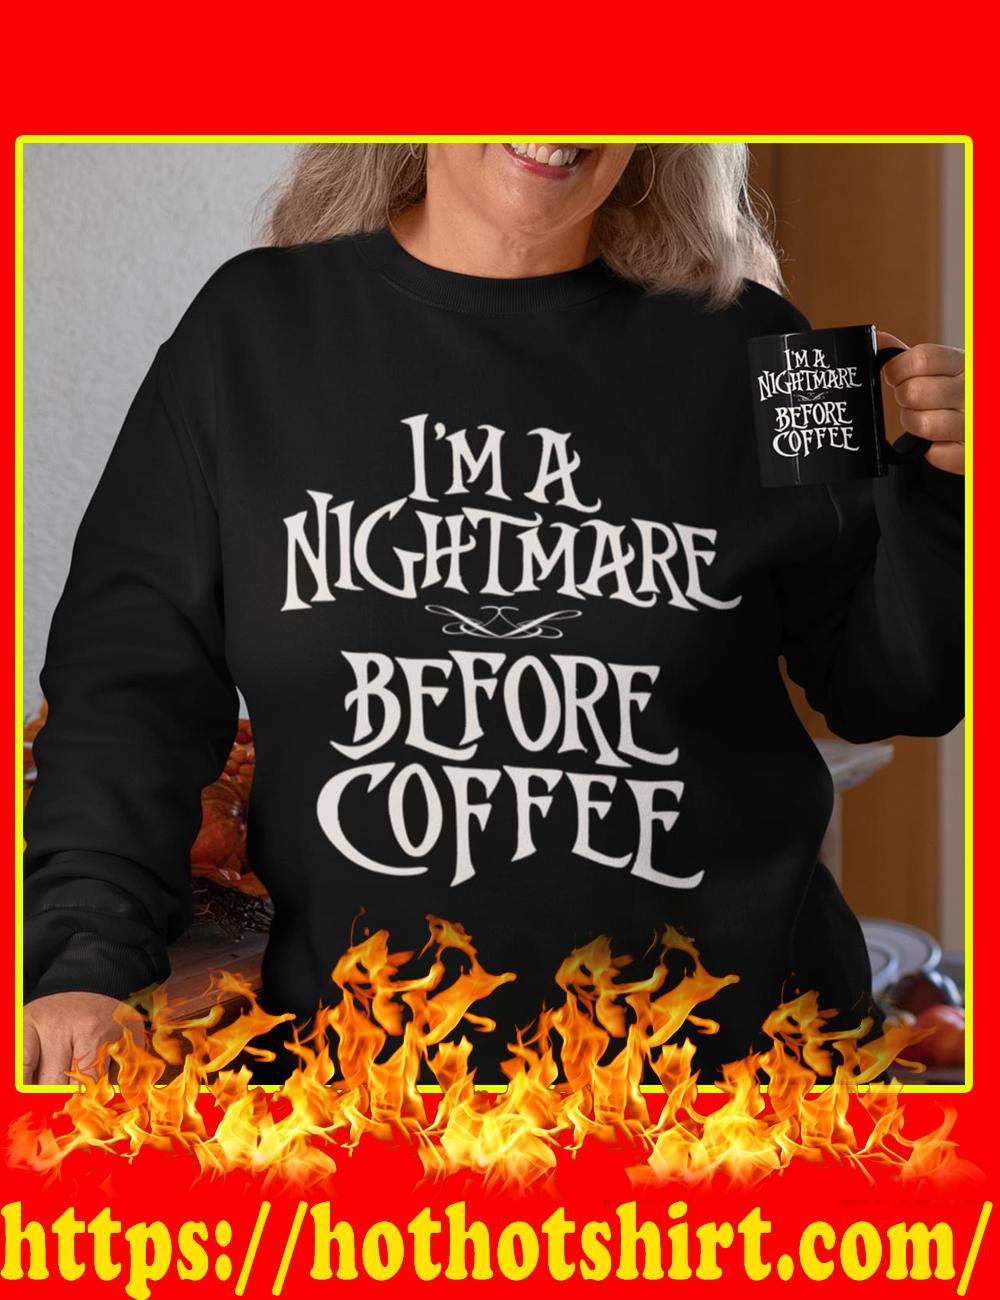 I'm a Nightmare Before Coffee shirt and mug